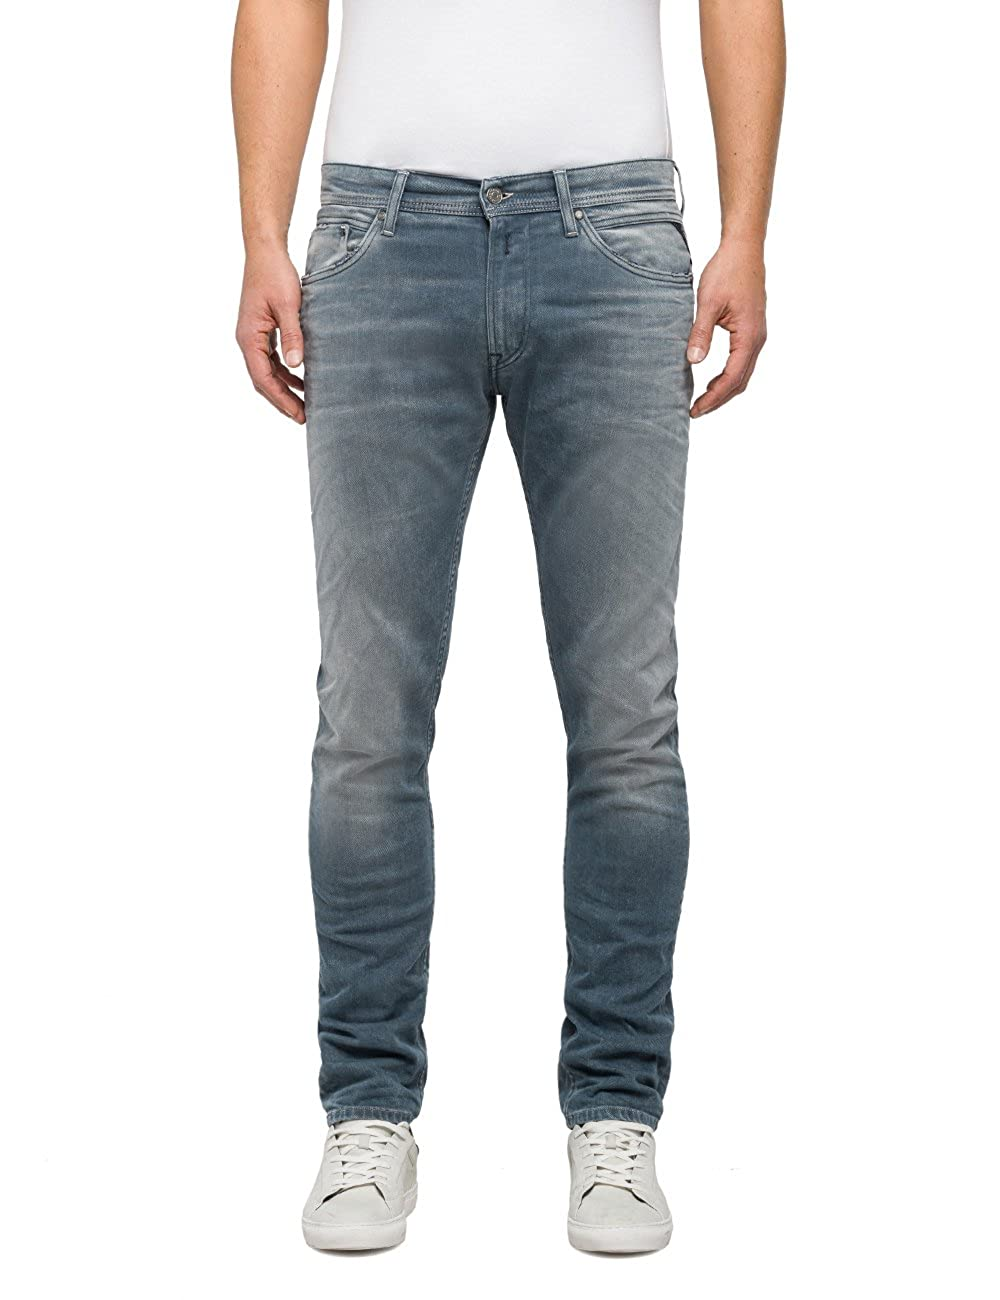 REPLAY Jondrill - Jeans Ajustados Hombre